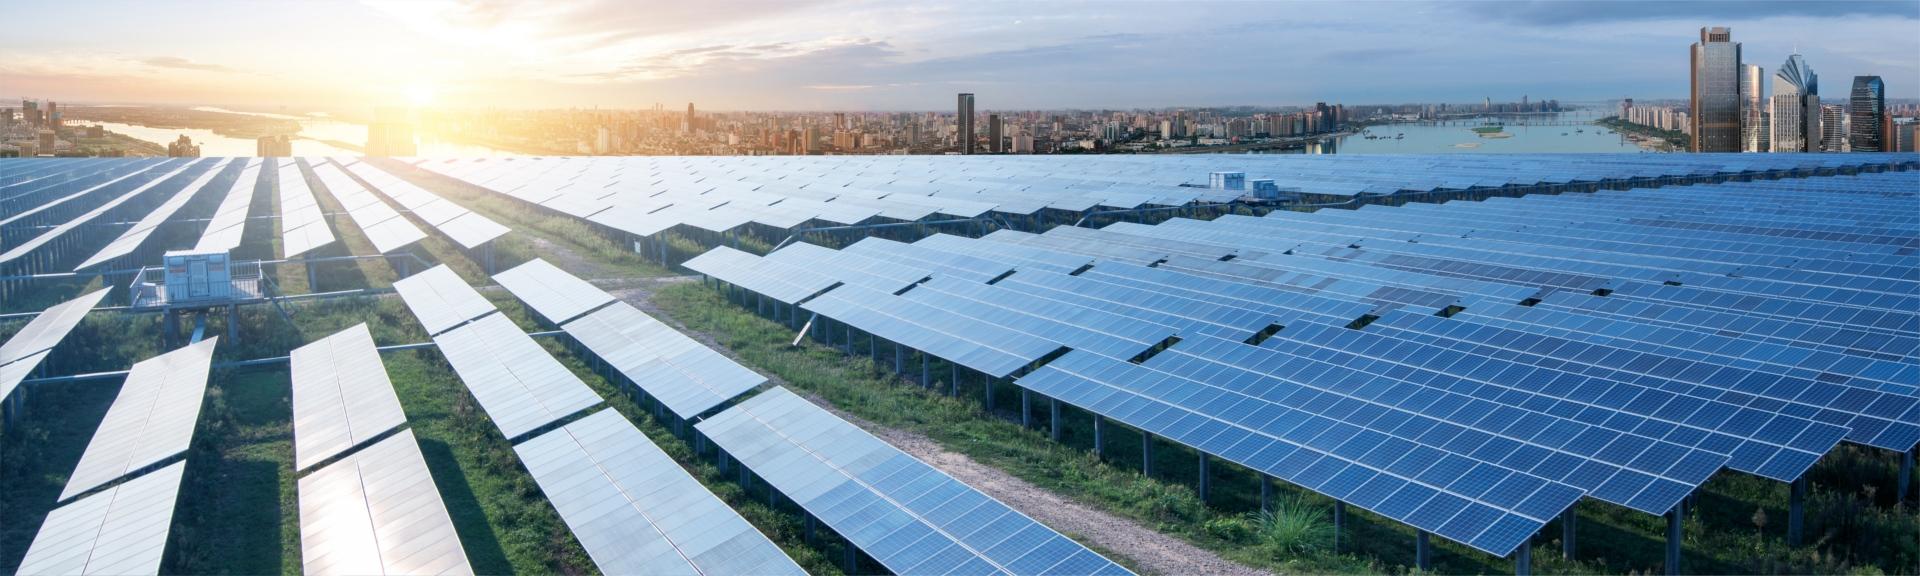 ABB – Farewell to solar business